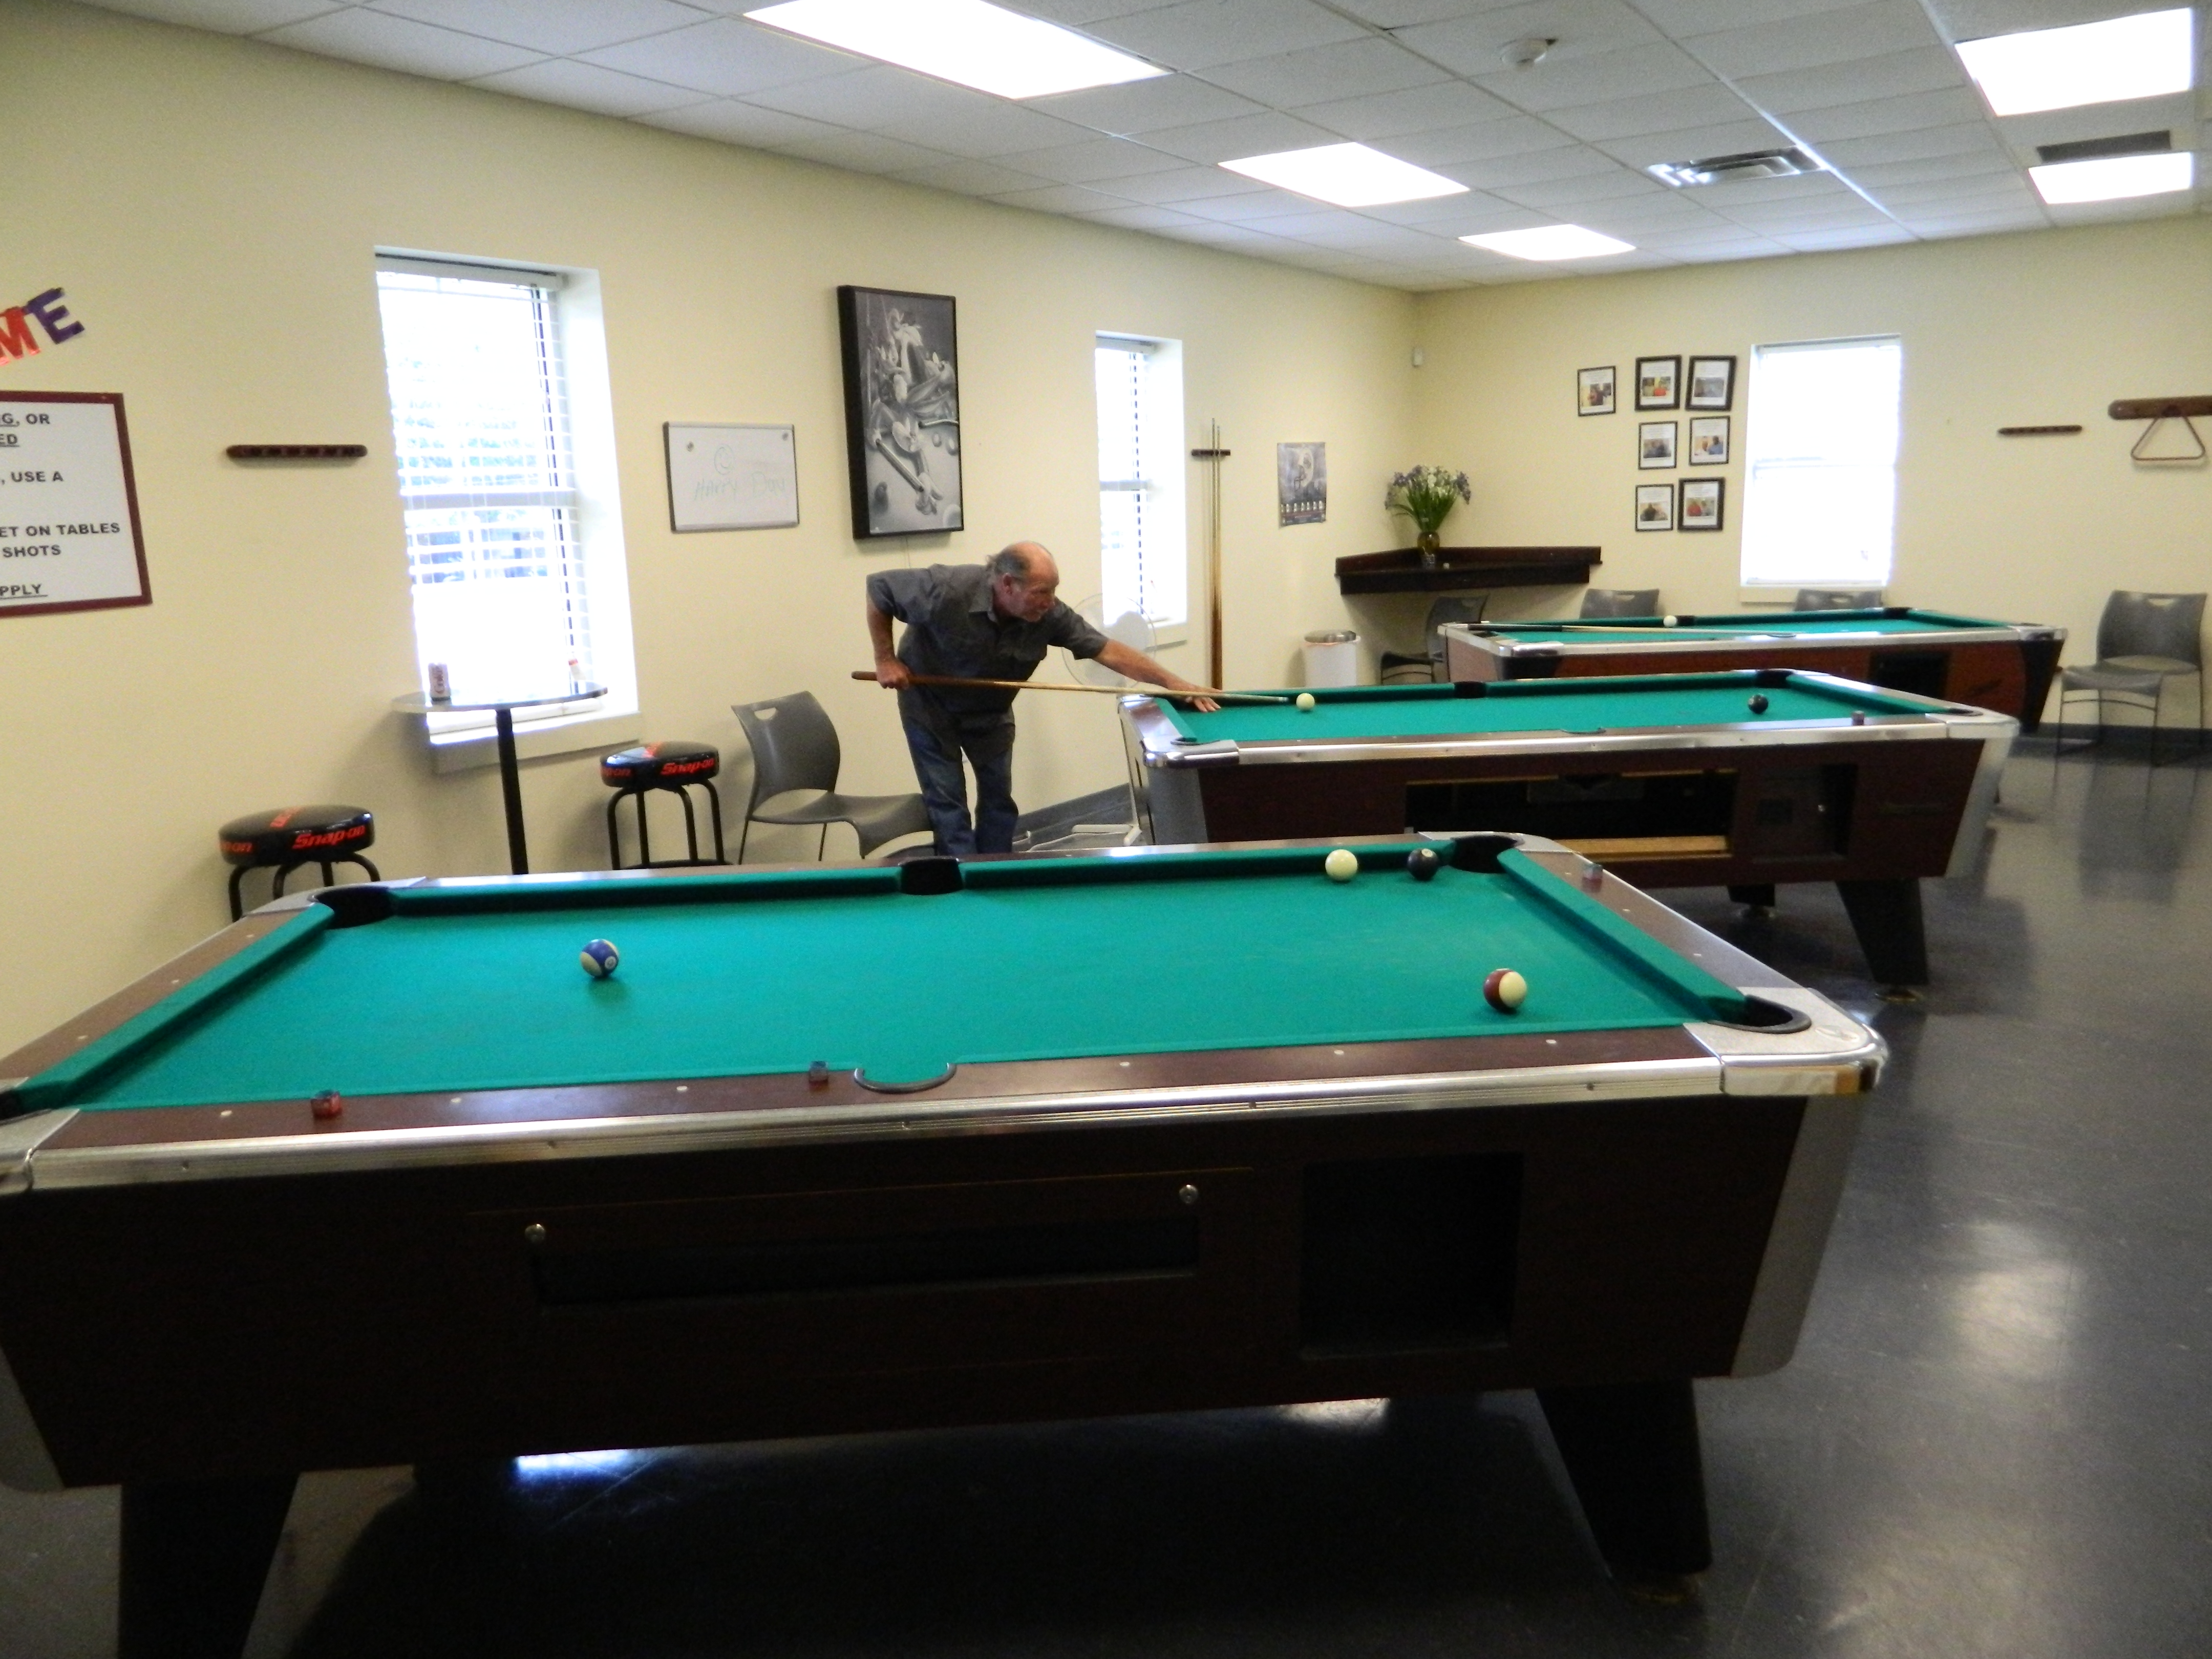 DSCN5230 pool